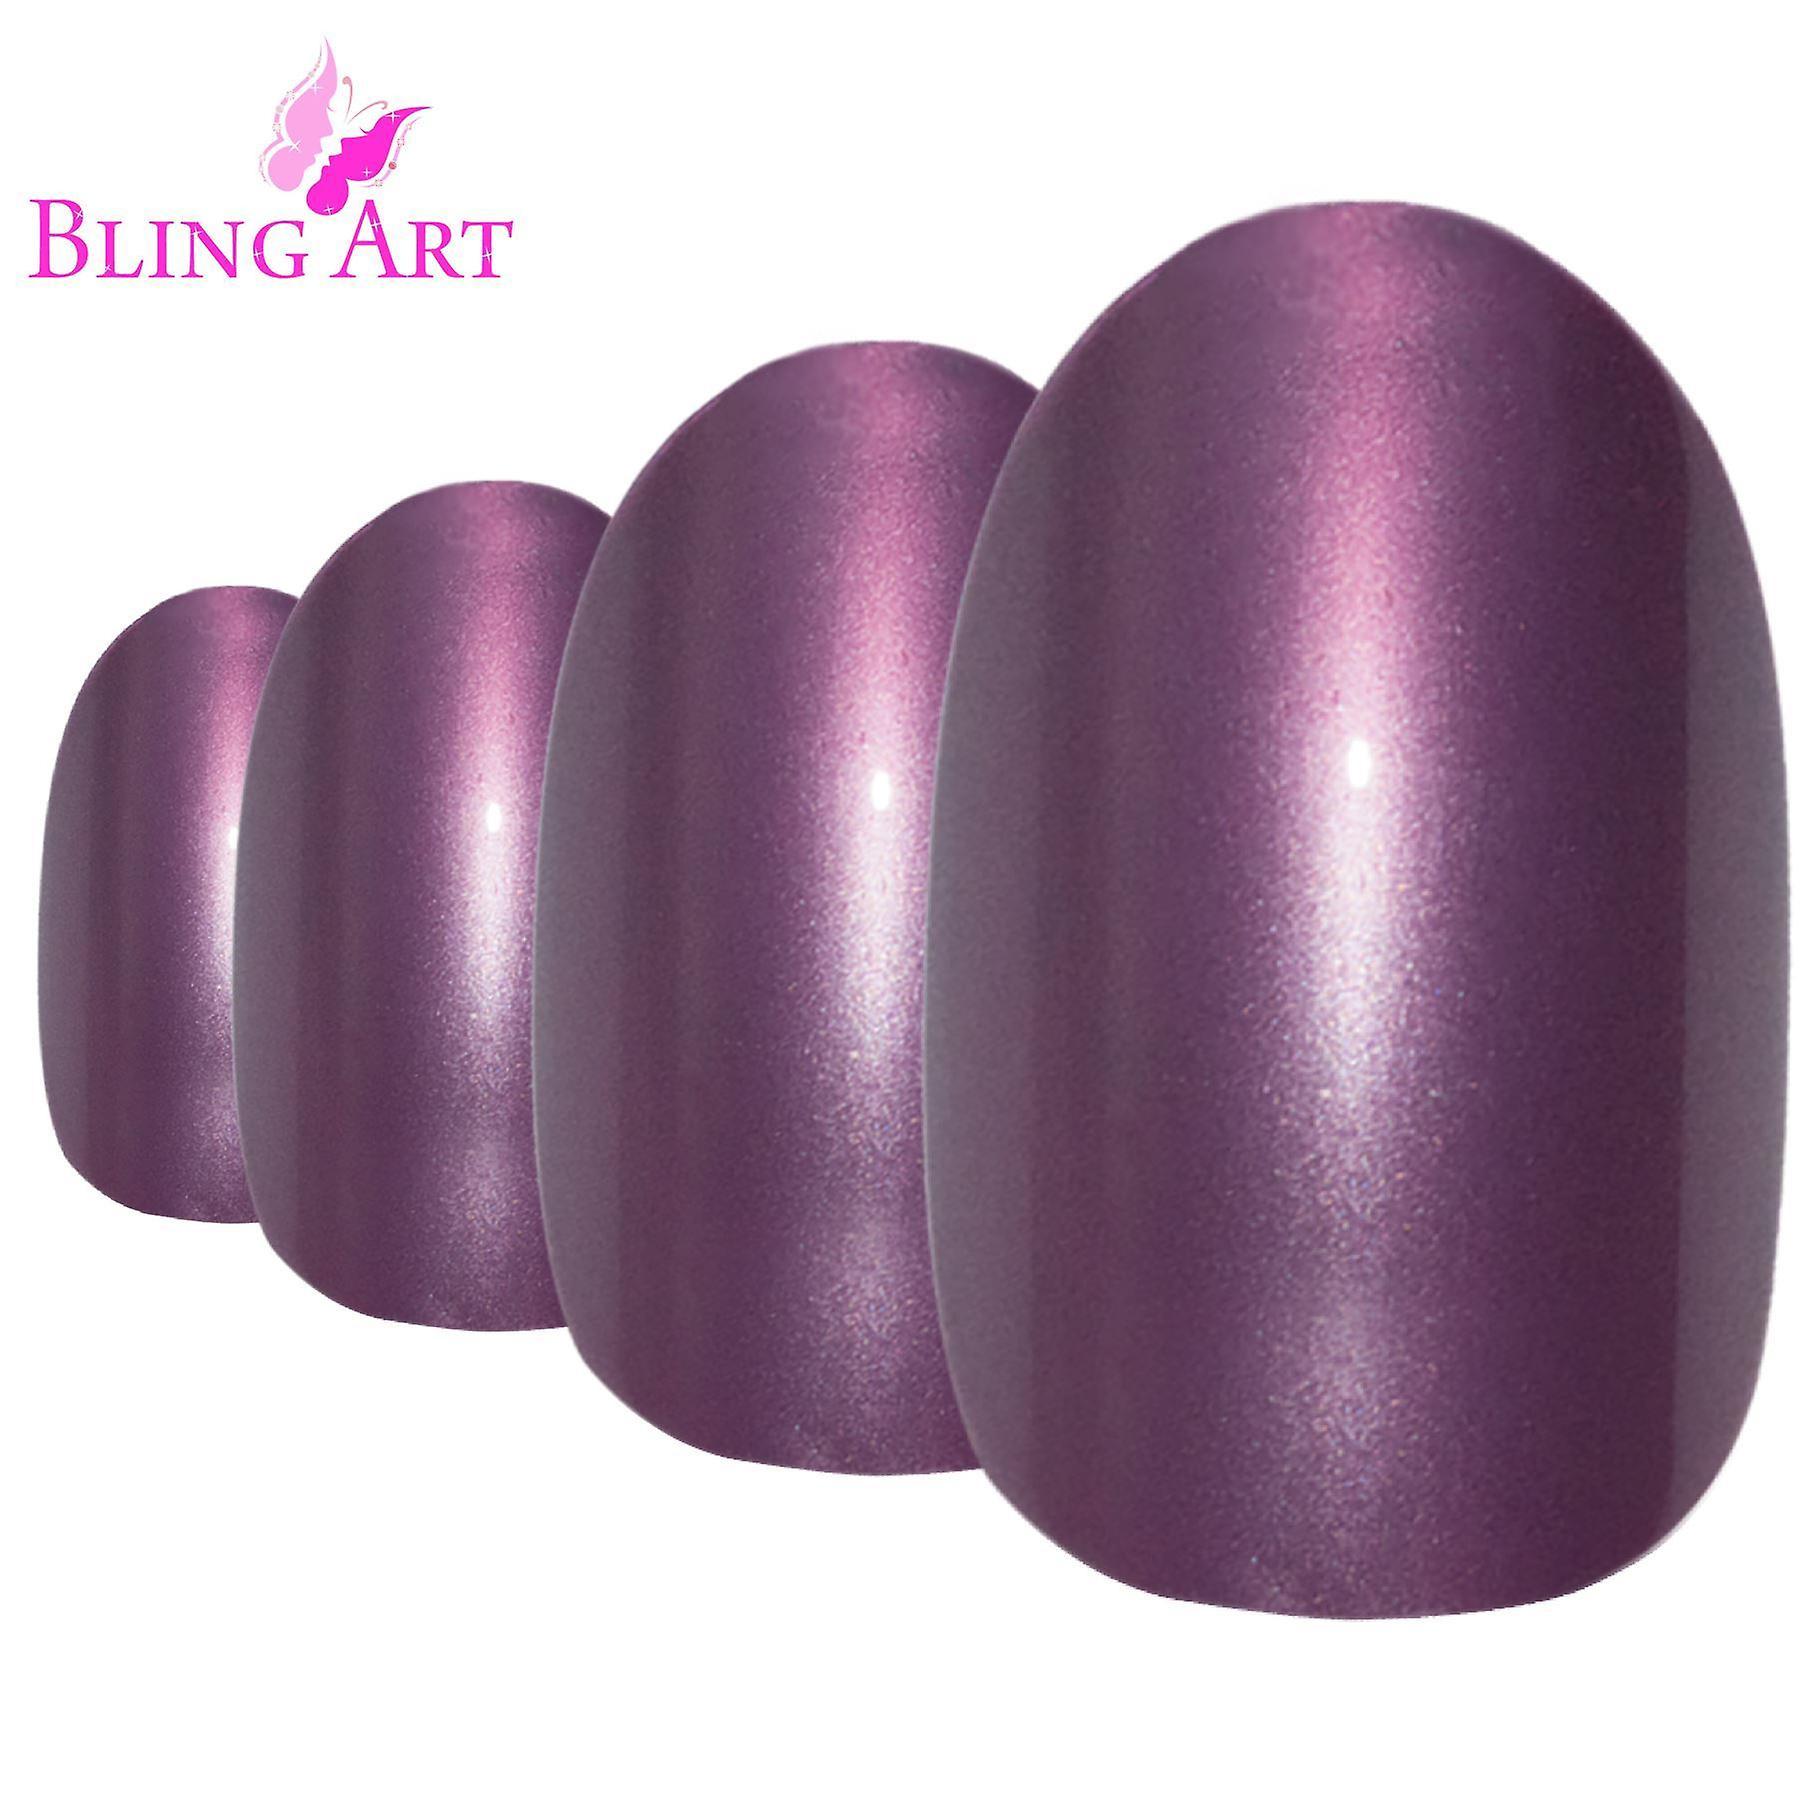 False nails by bling art purple glitter oval medium fake acrylic 24 tips with glue